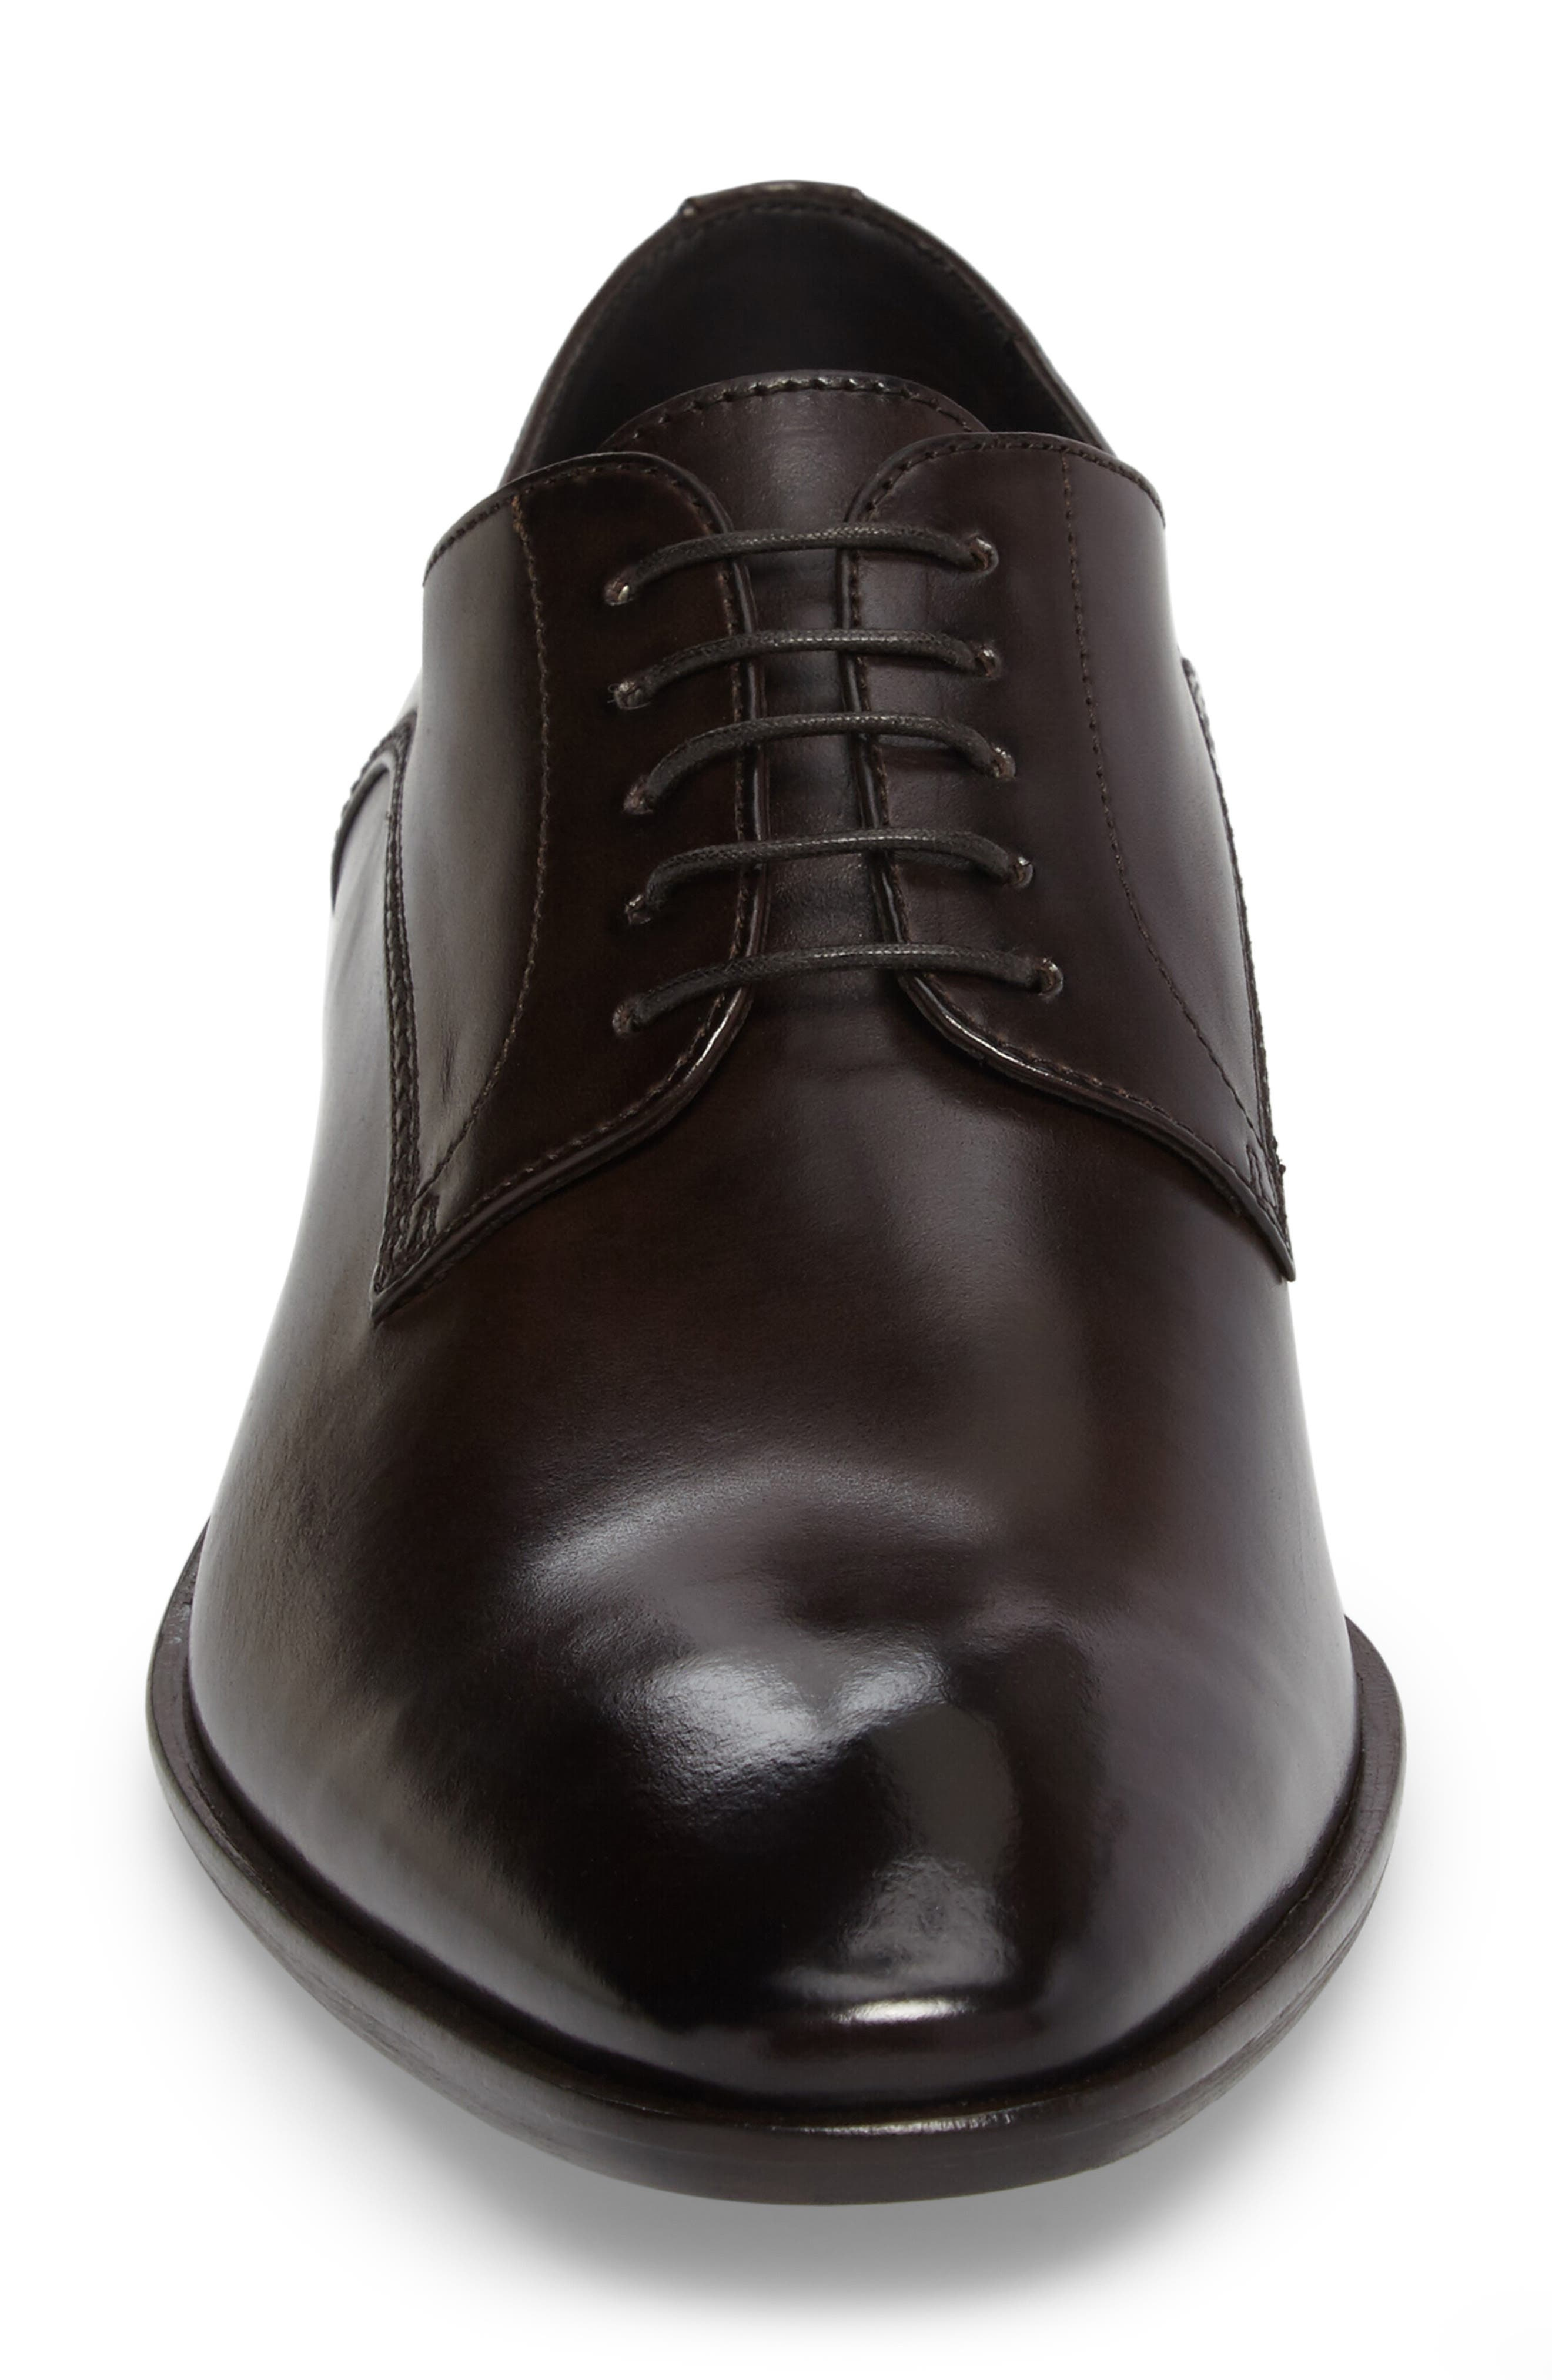 Carmons Plain Toe Derby,                             Alternate thumbnail 4, color,                             Dark Brown Leather